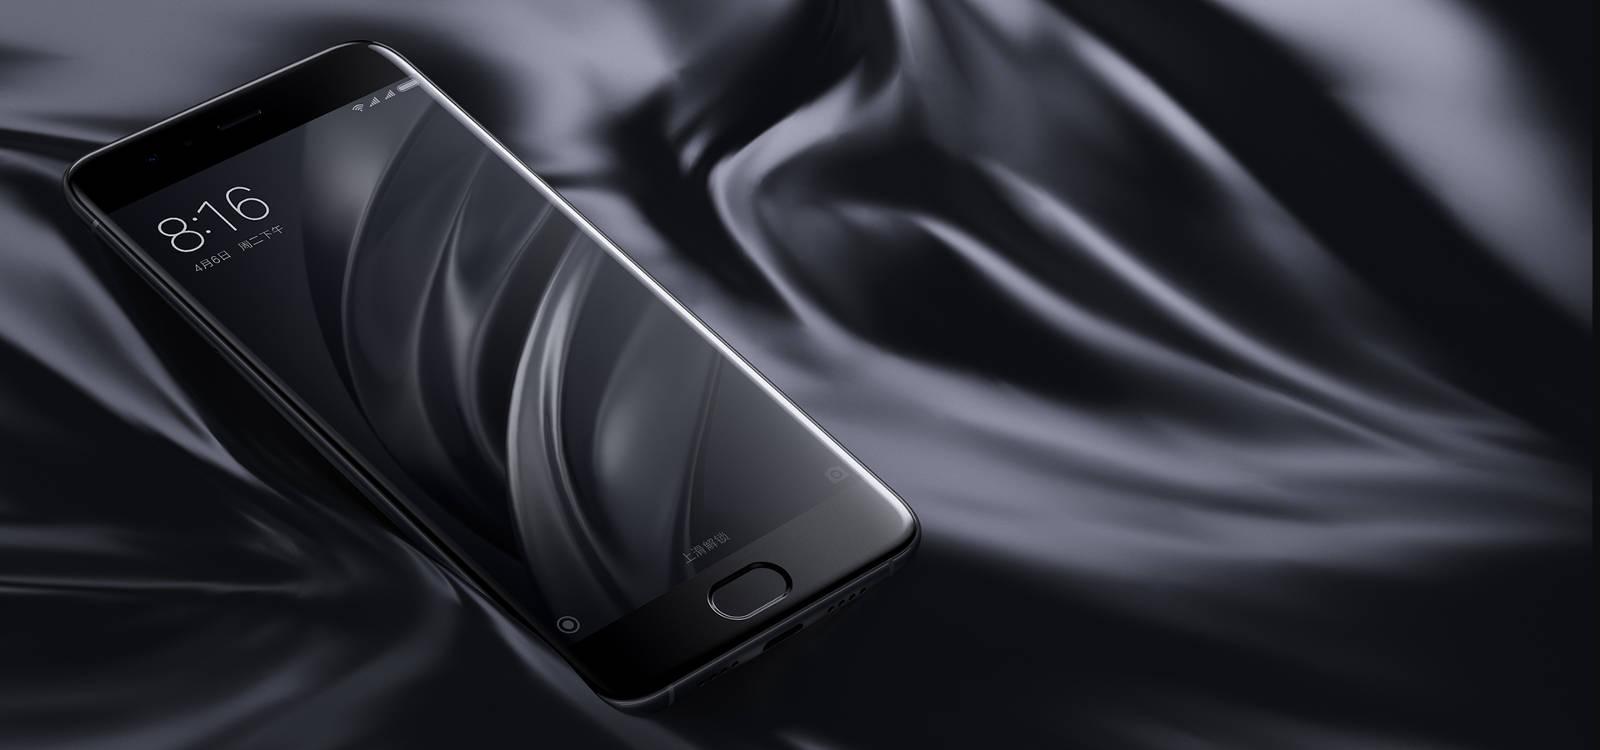 Xiaomi Mi 6. Дата выхода Mi 6, цена